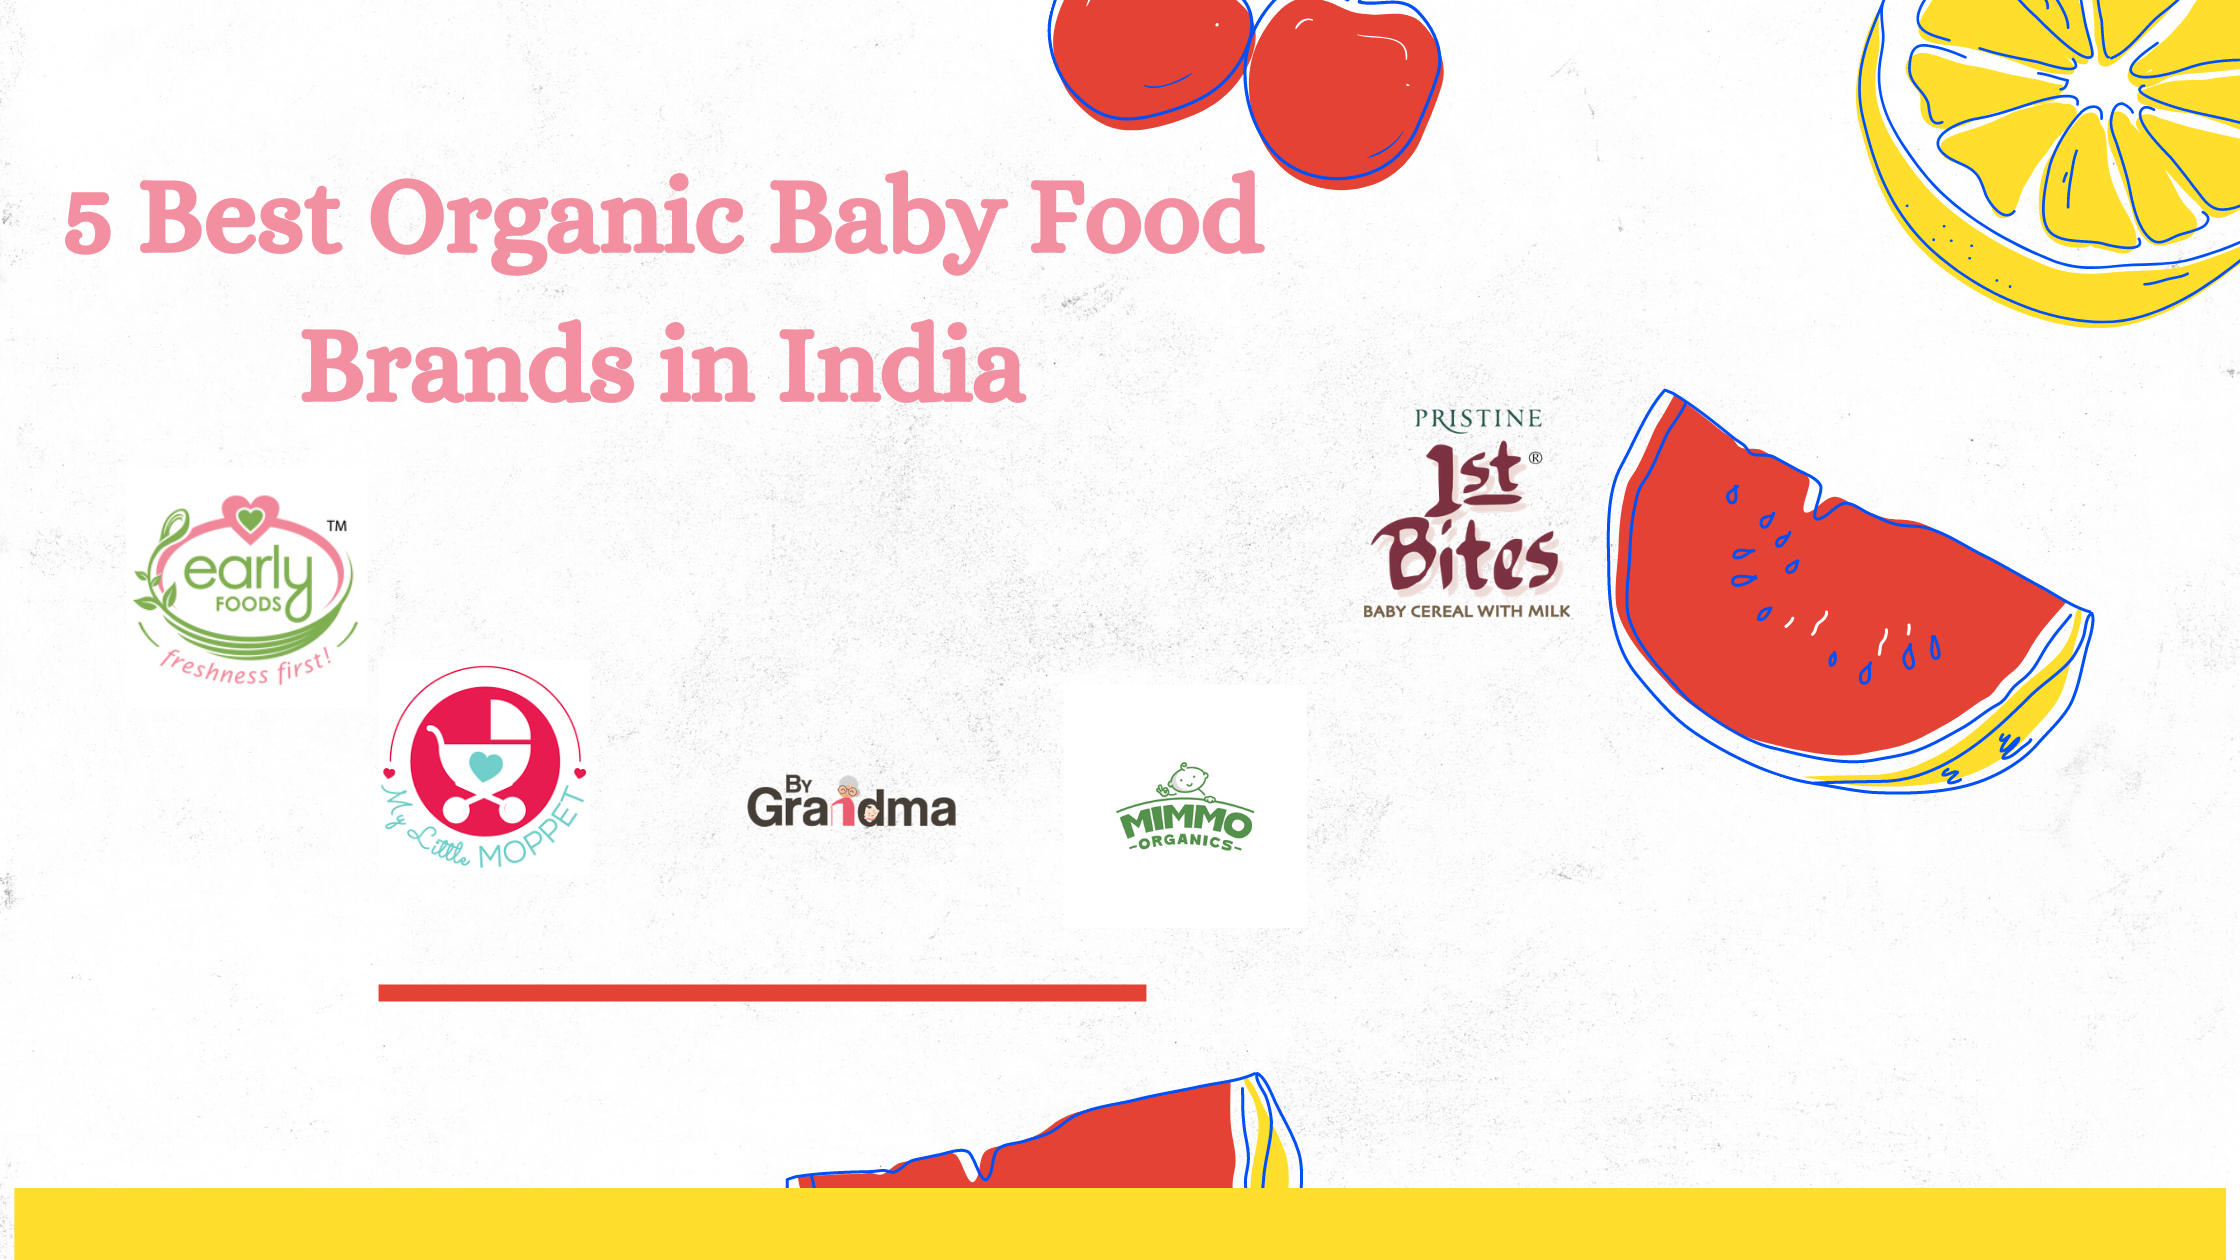 5 Best Organic Baby Food Brands in India 2020